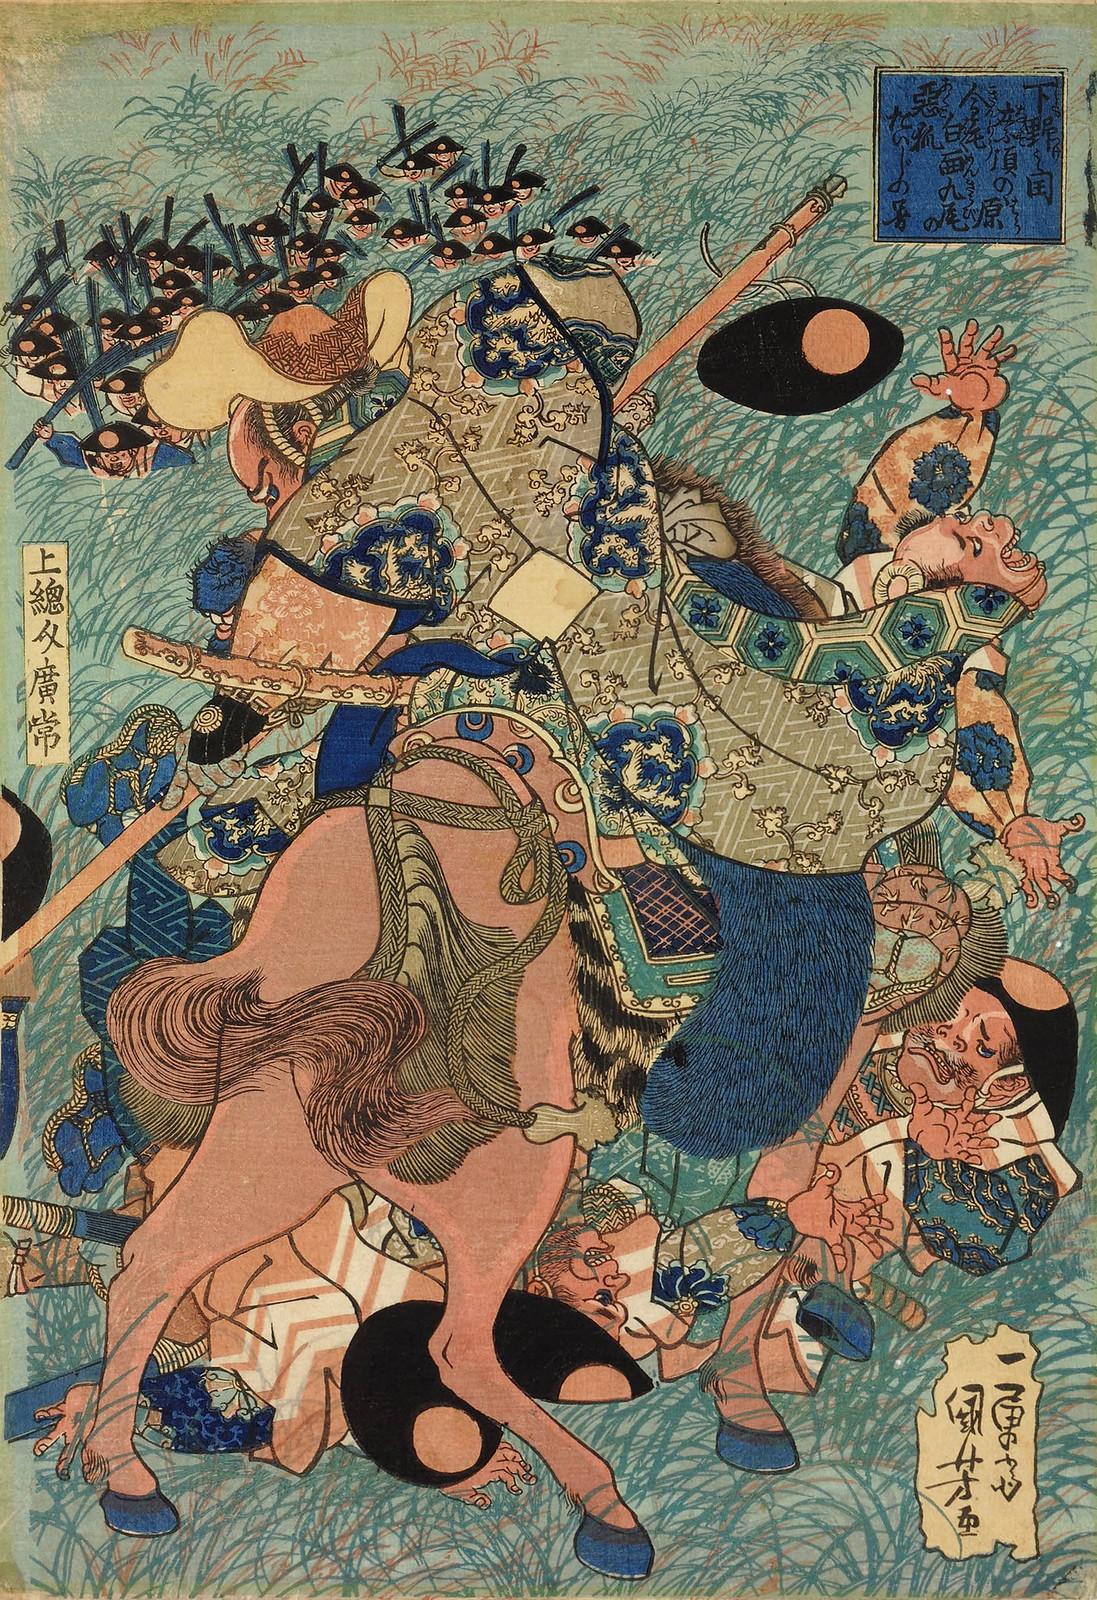 Utagawa Kuniyoshi - The Nine-tailed Fox slain on Nasu moor, Shimotsuke, 1834 (right panel)